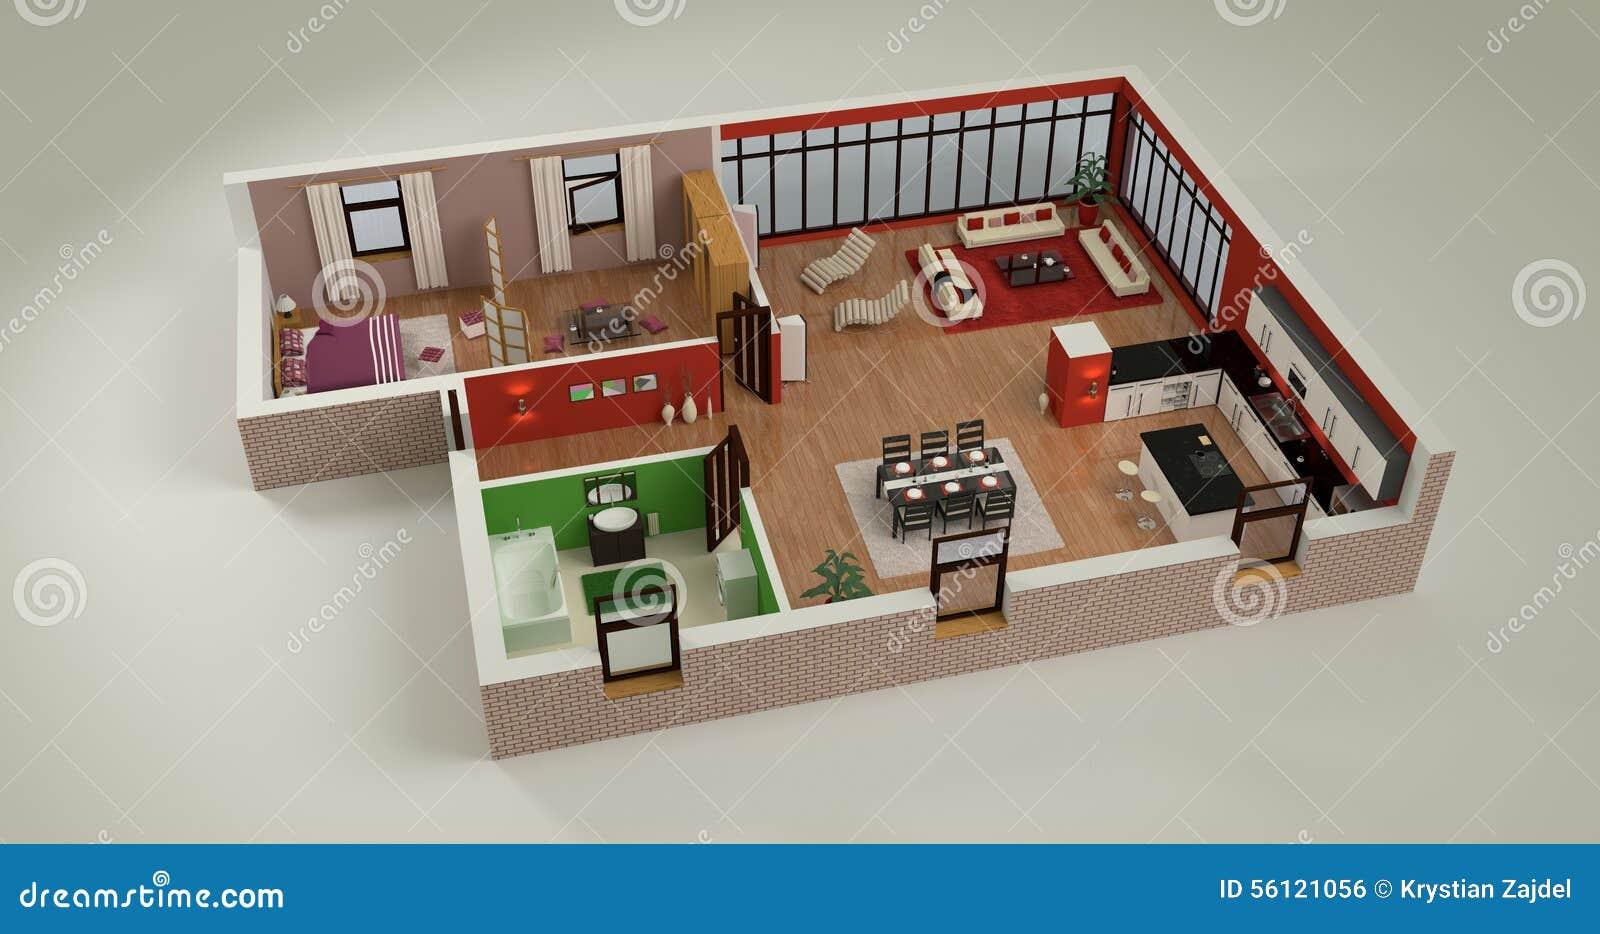 Chambre Simple Moderne : Maquette De Chambre Illustration Stock – Image: 56121056